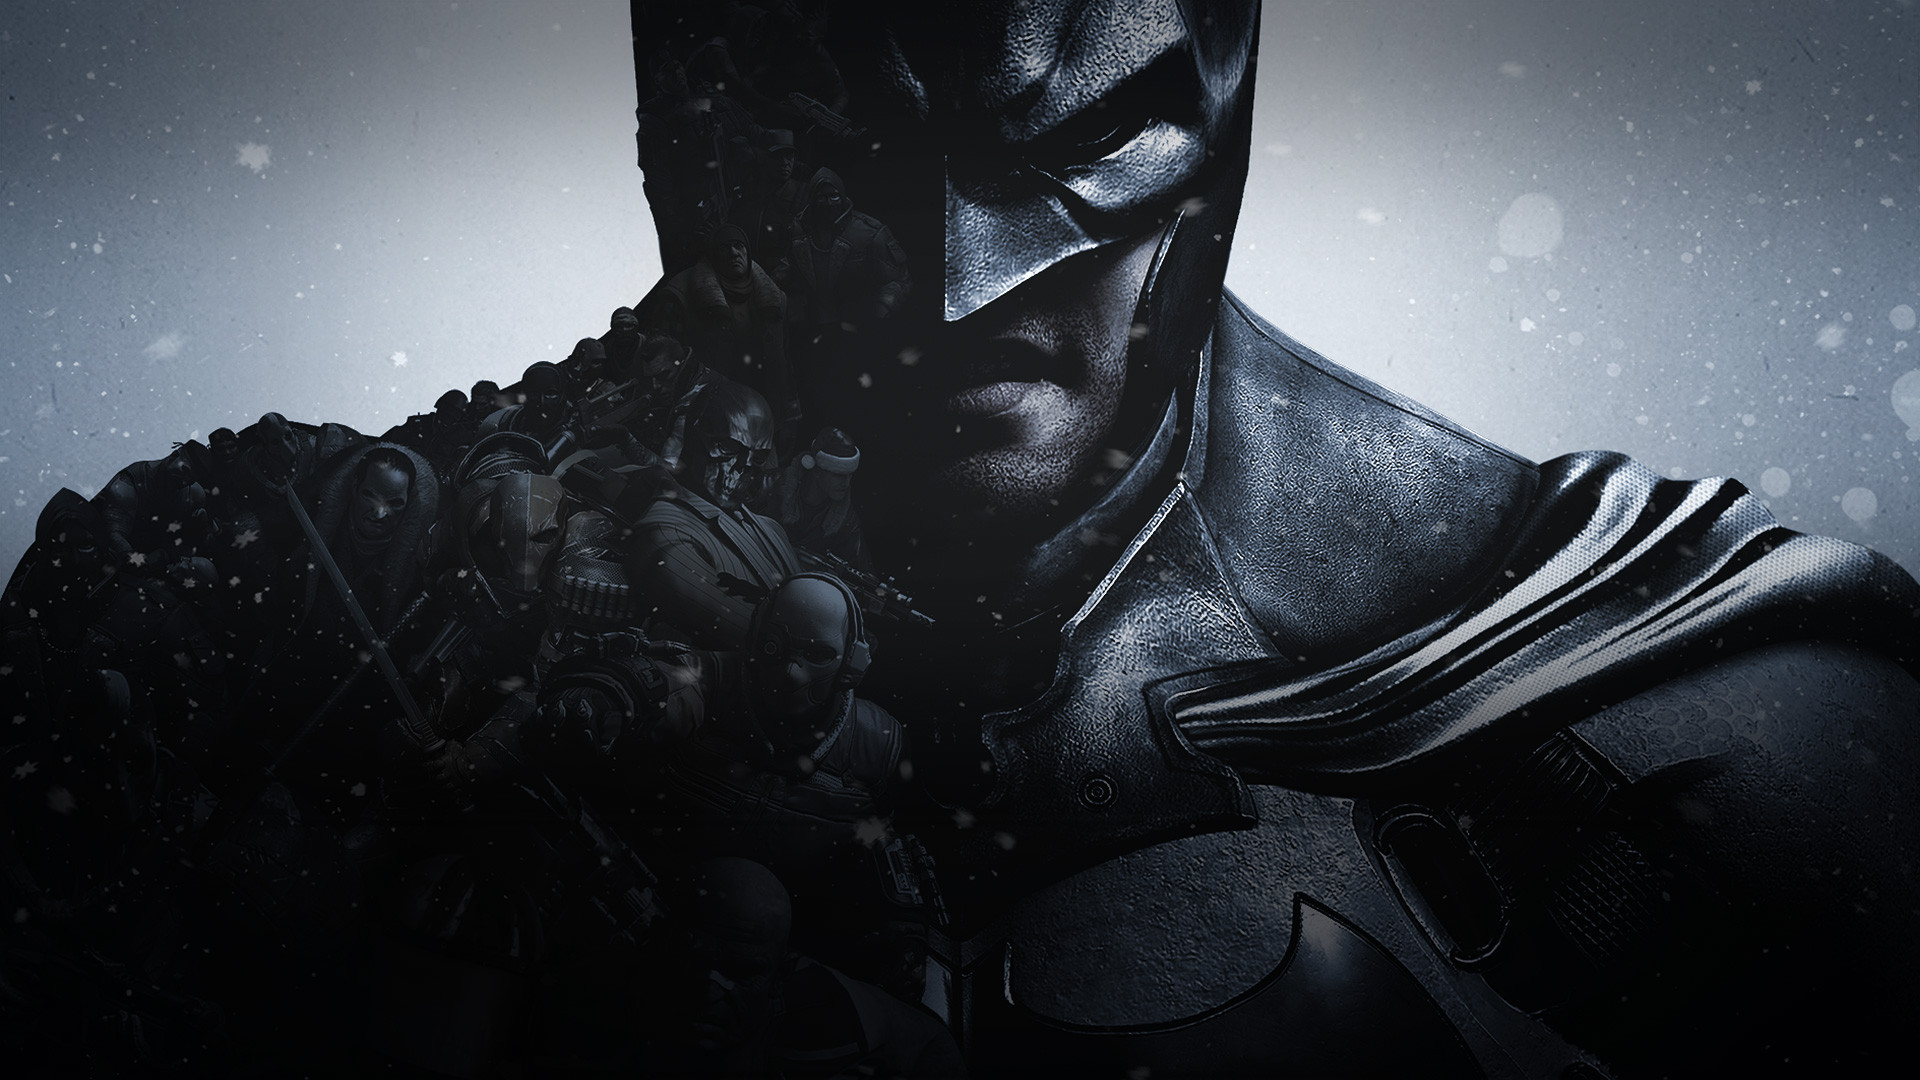 Movie Wallpaper: Batman Vs Superman Desktop Wallpaper Wallpaper HD .